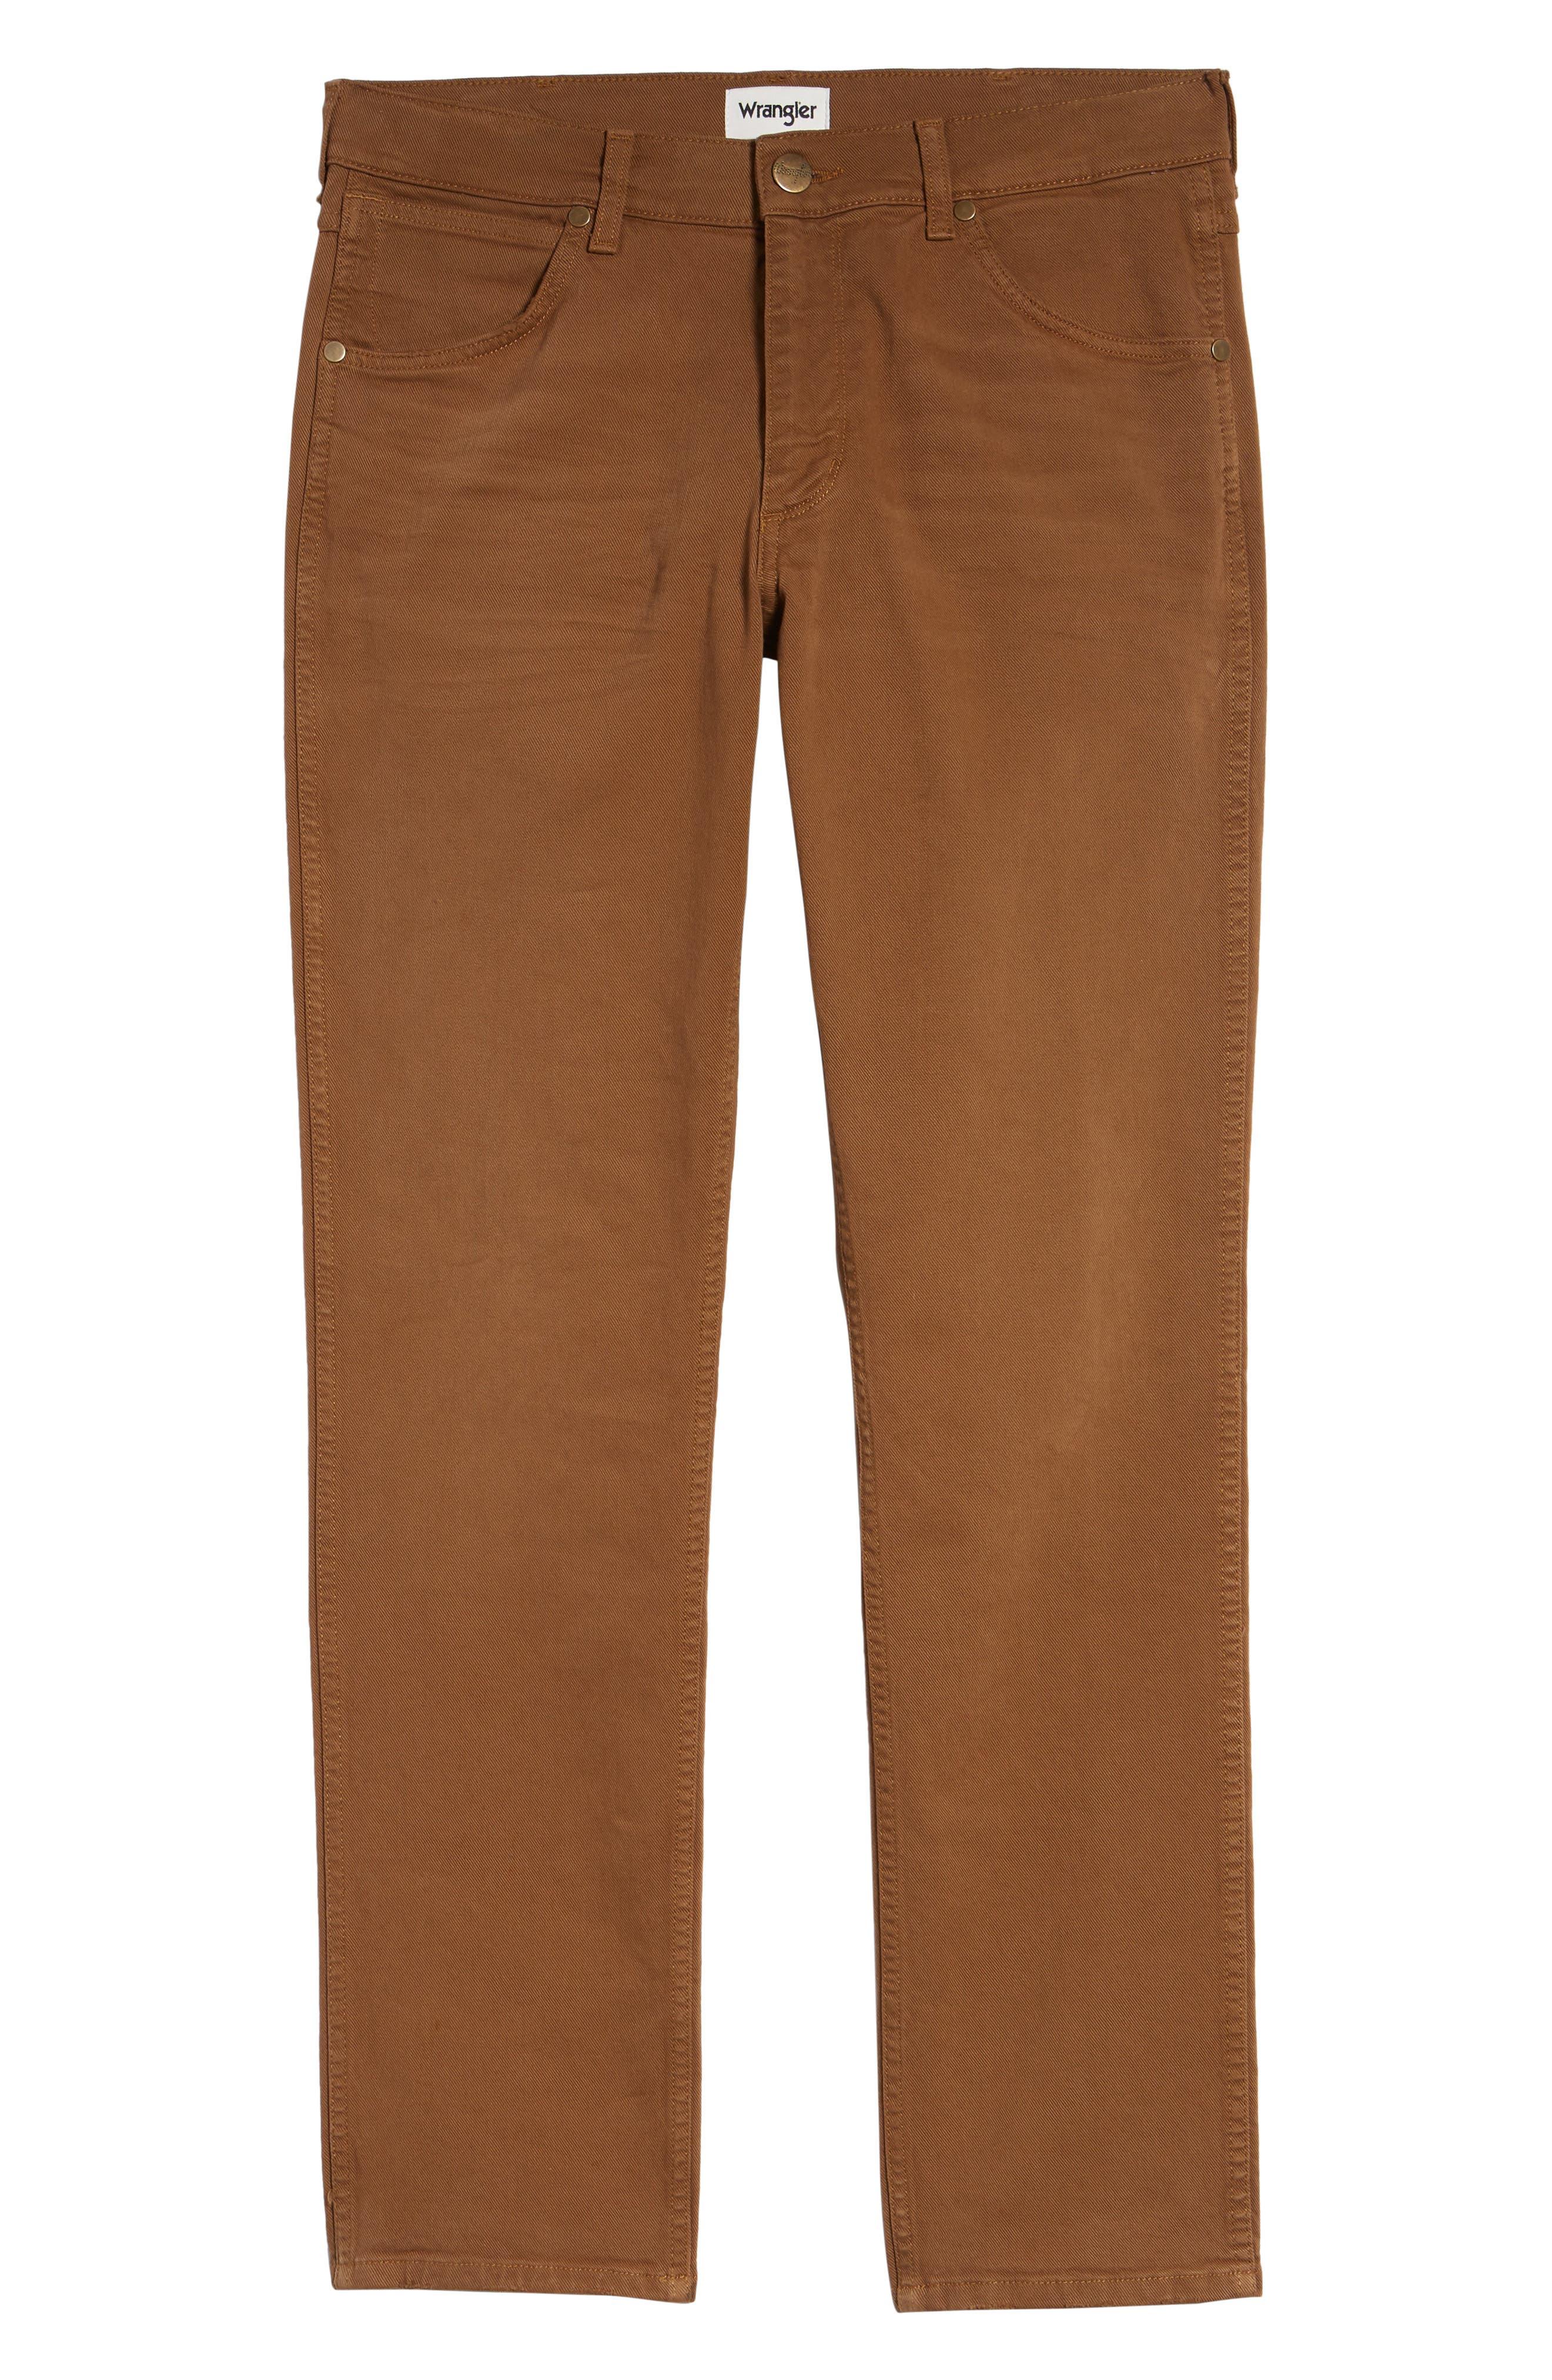 WRANGLER,                             Greensboro Straight Leg Pants,                             Alternate thumbnail 6, color,                             BISCUIT